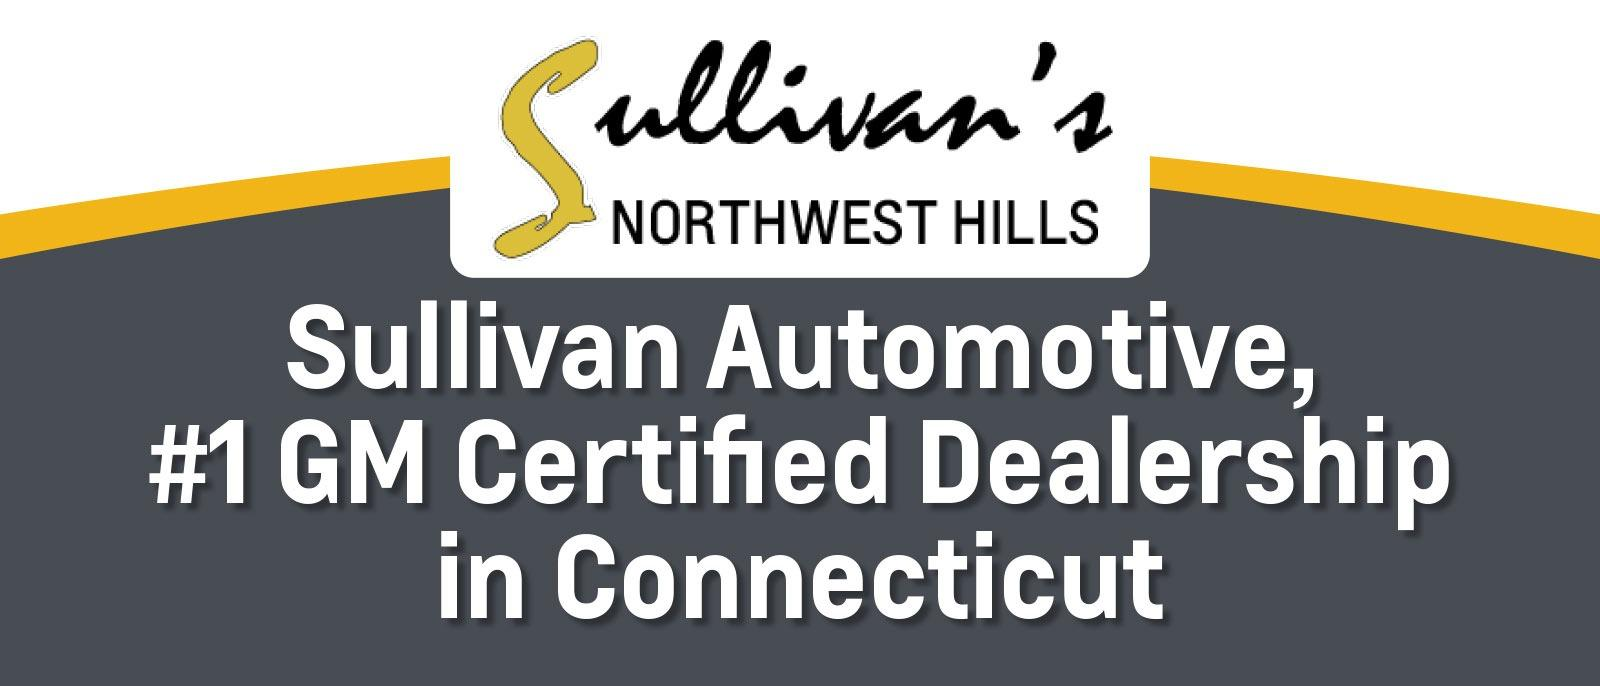 Sullivan Automotive #1 GM Certified Dealership in Connecticut